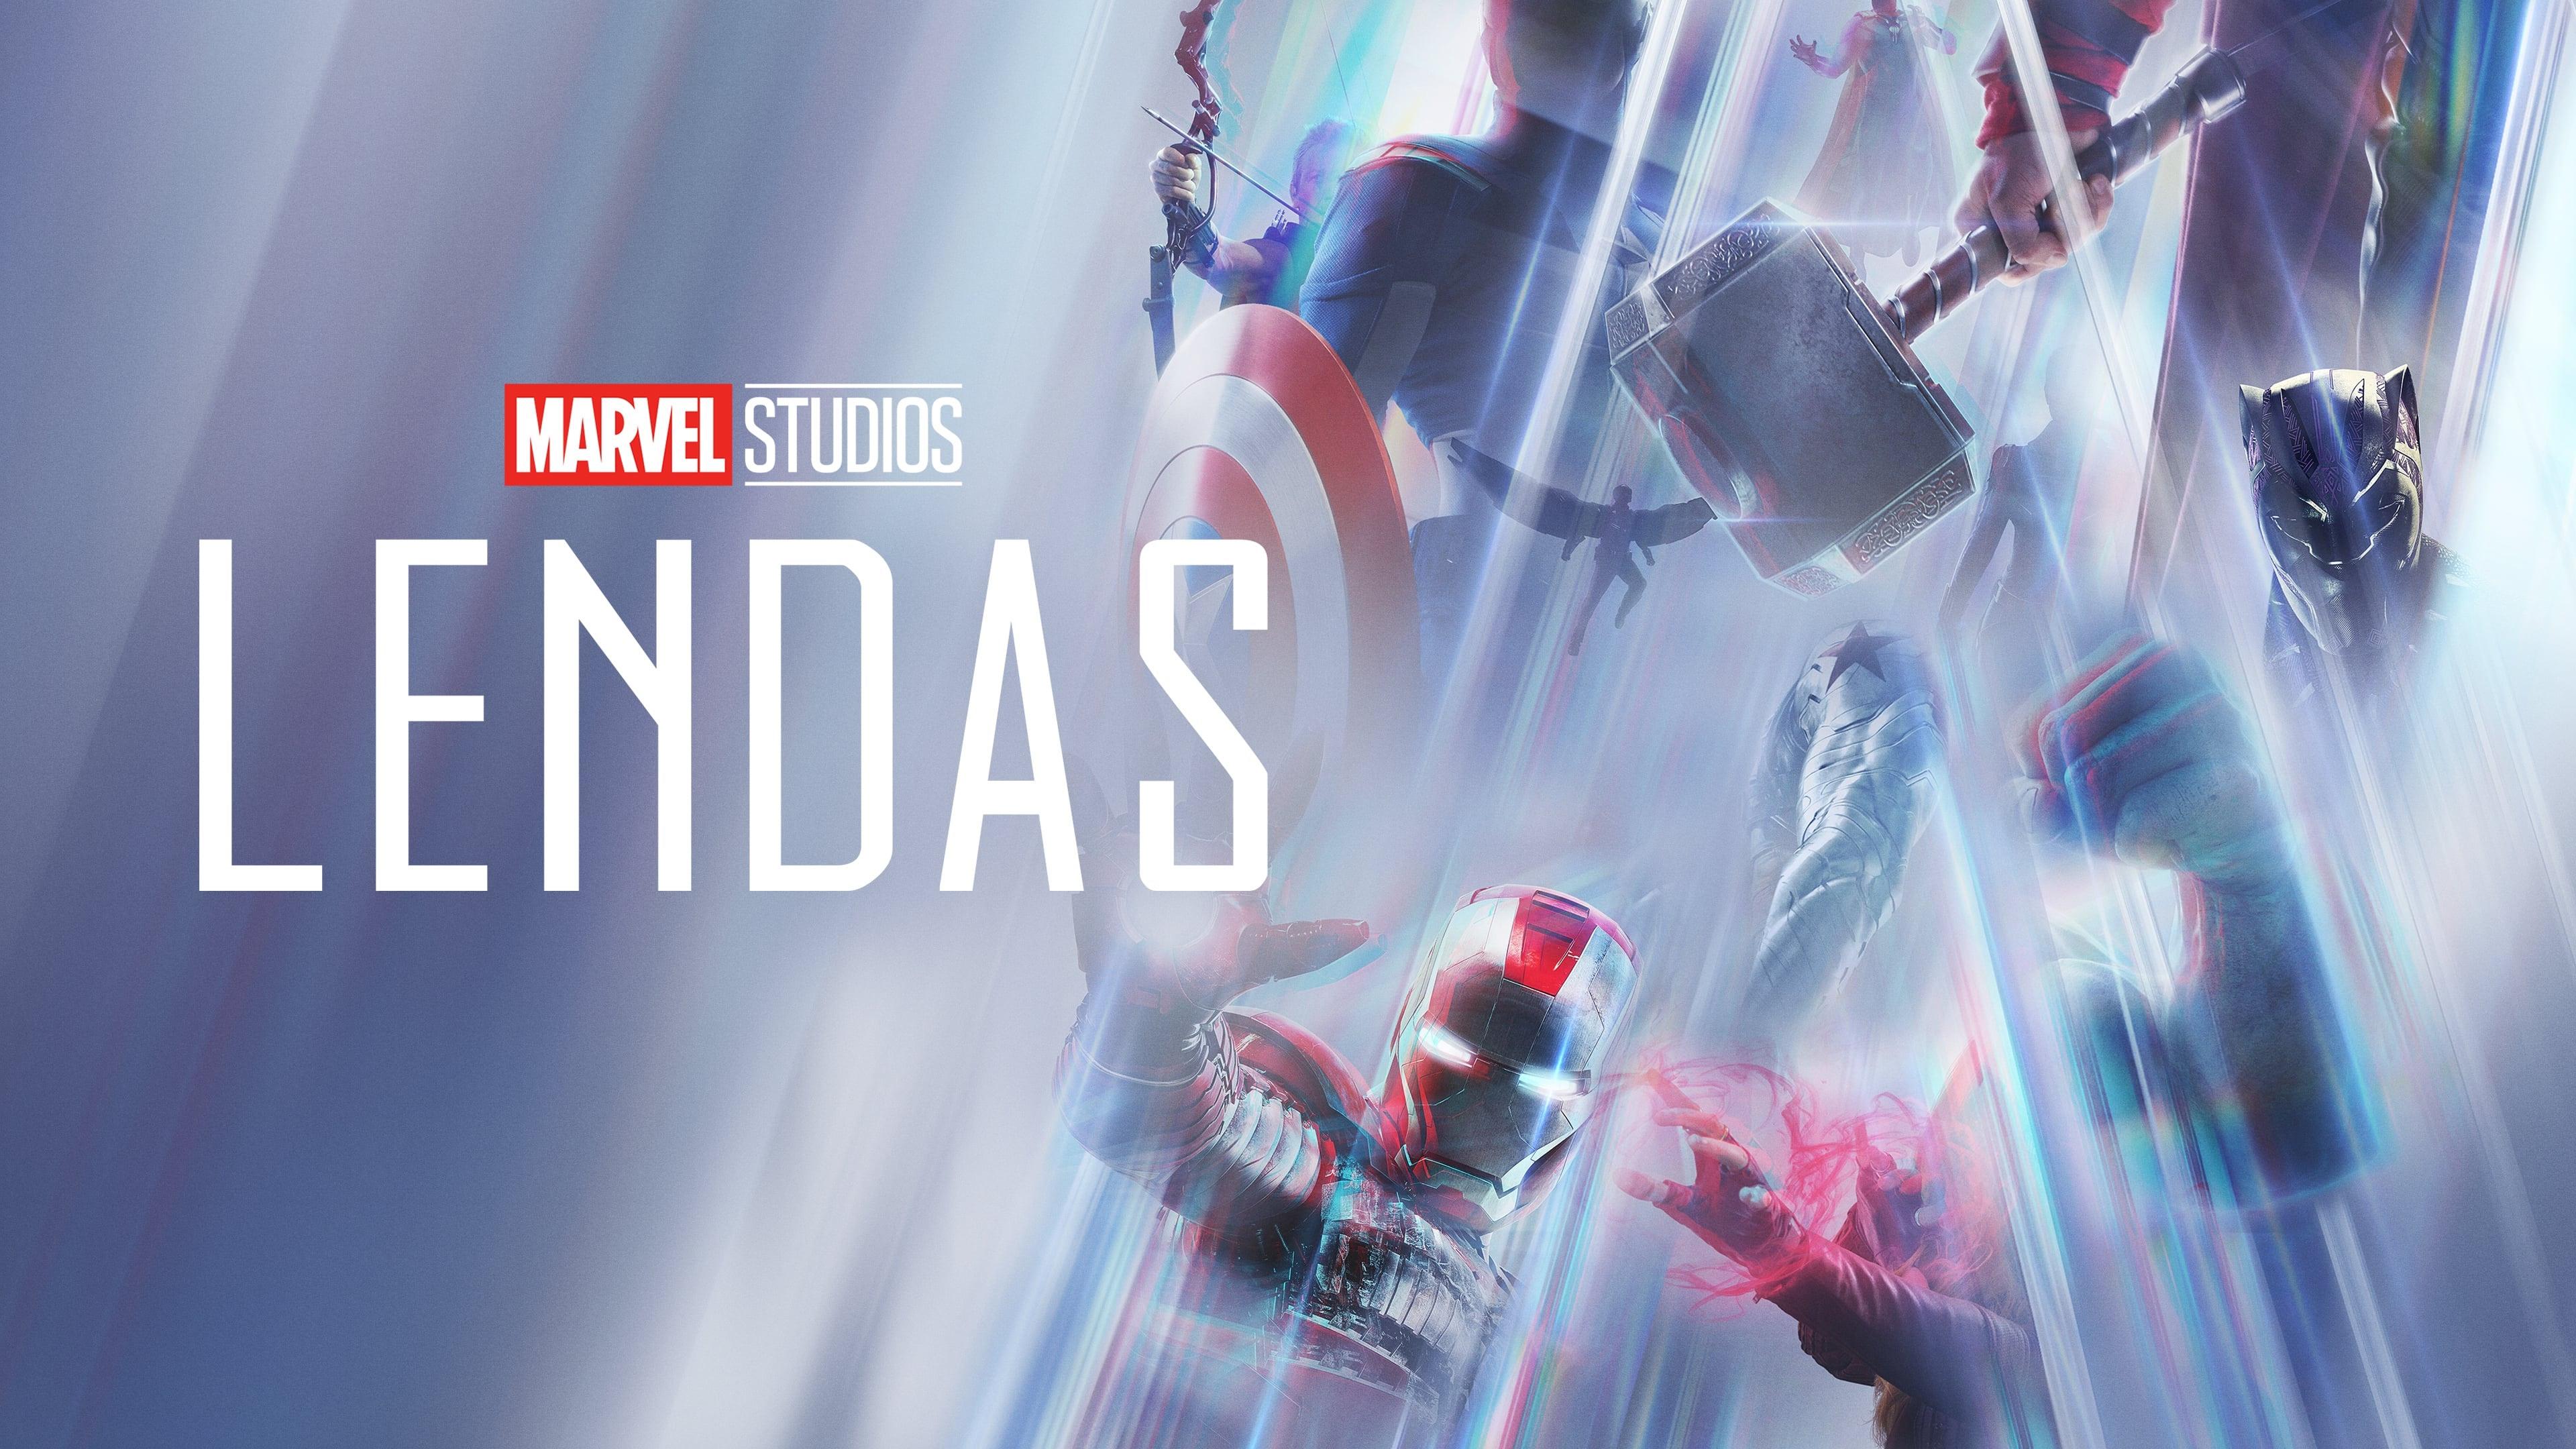 Marvel Studios: Legends S1E7